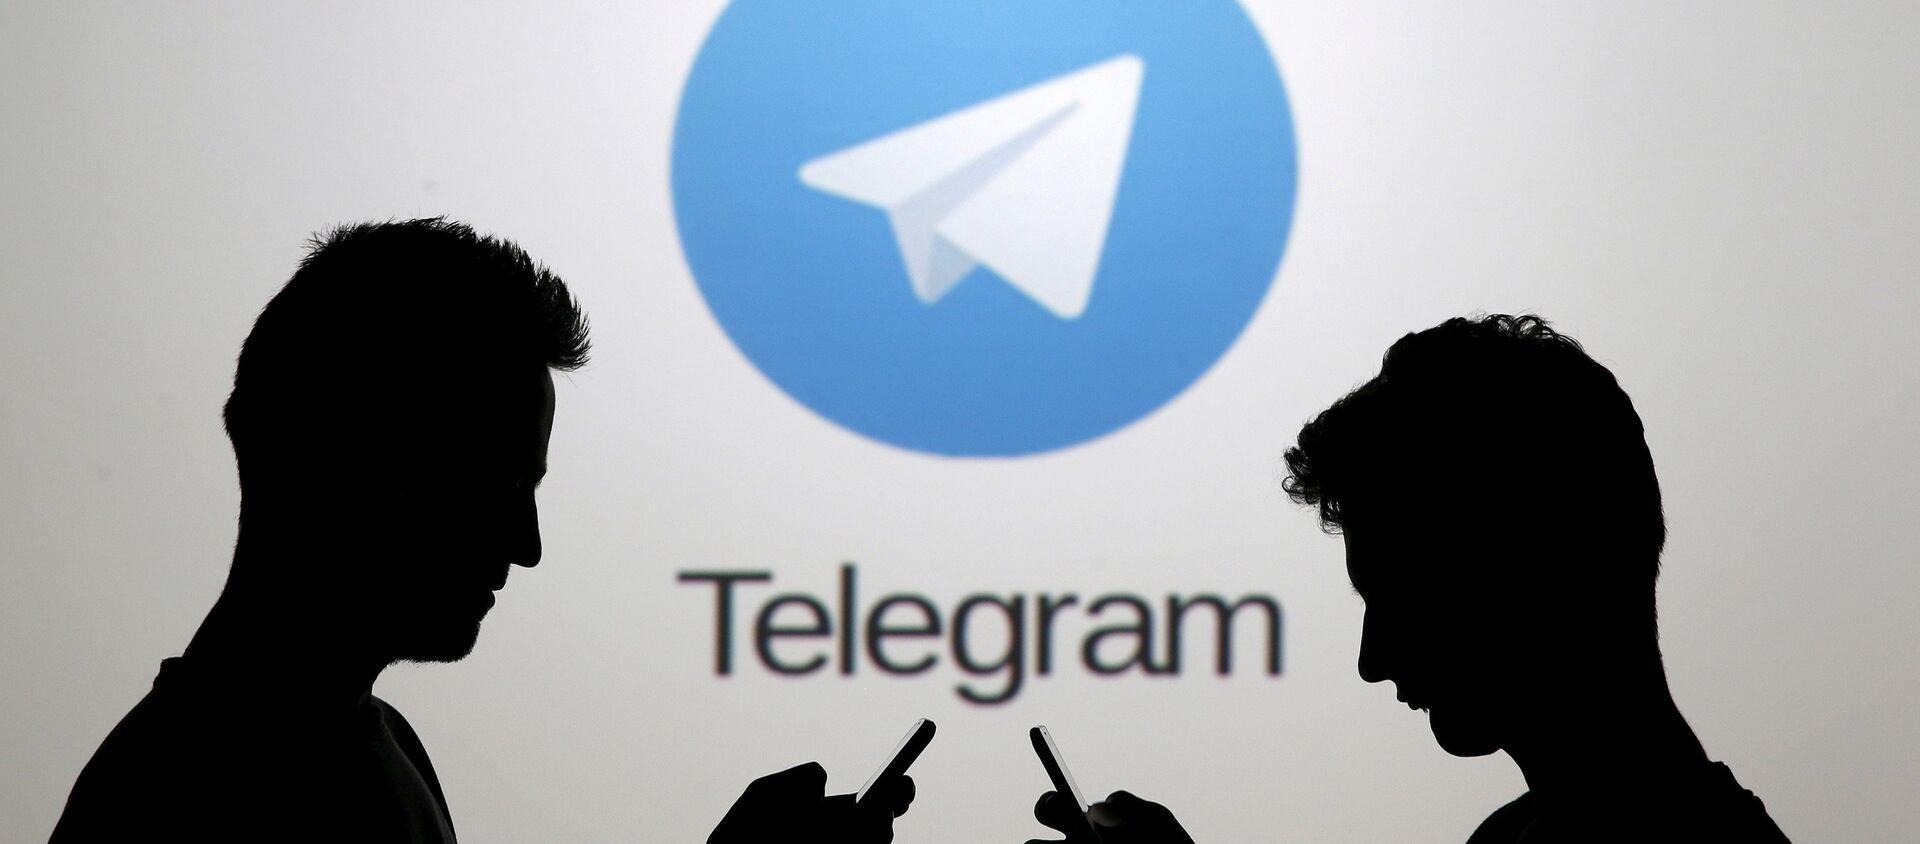 Telegram - Sputnik Srbija, 1920, 08.02.2021